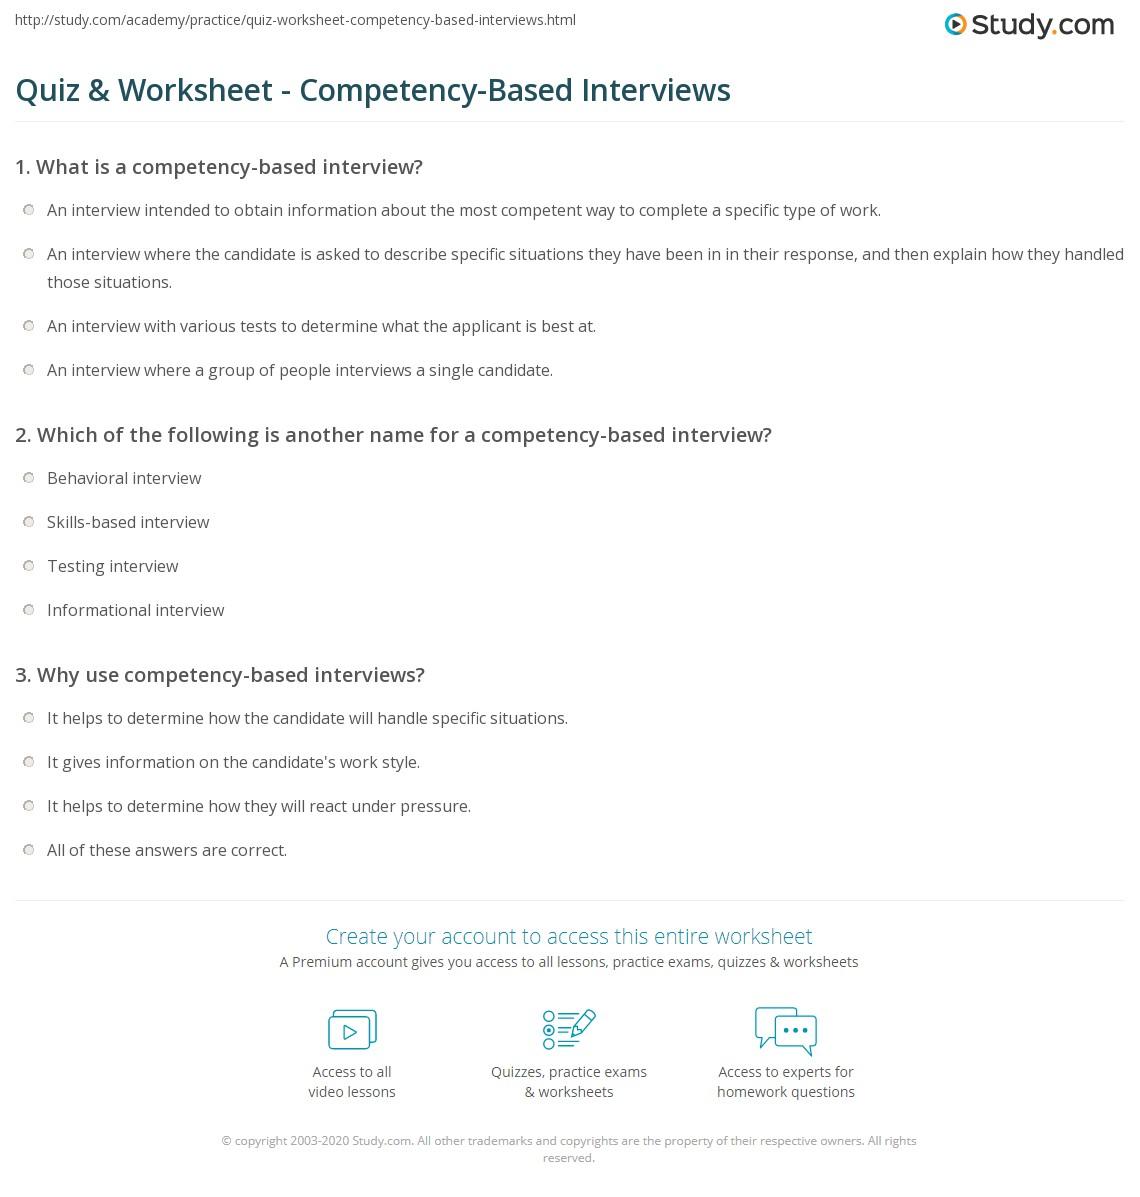 quiz worksheet competency based interviews com print what is a competency based interview examples overview worksheet